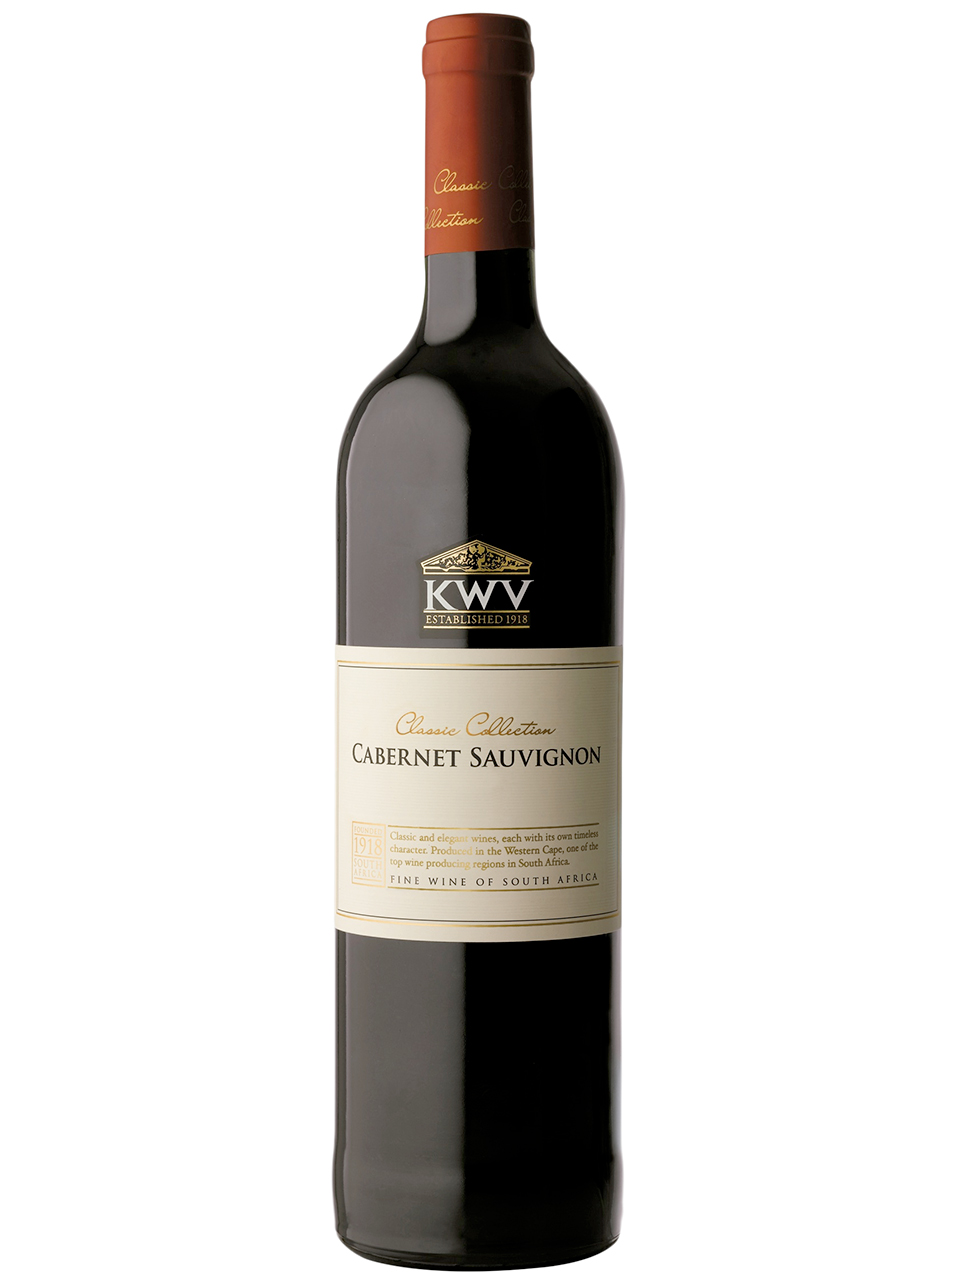 KWV Classic Collection Cabernet Sauvignon